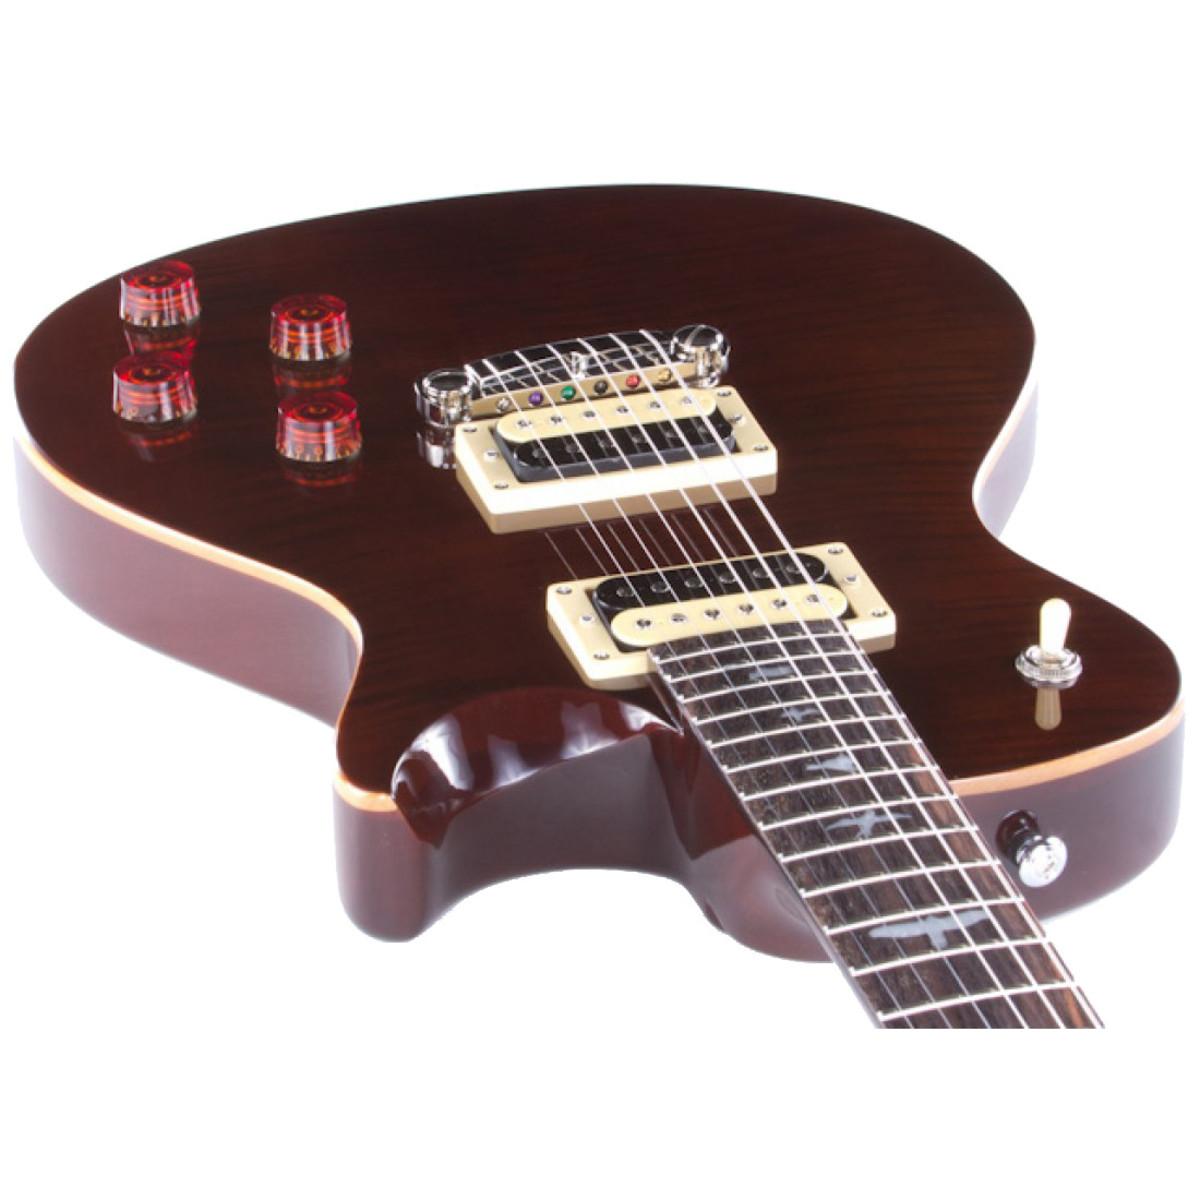 disc prs se singlecut 245 electric guitar tortoise shell gift at gear4music. Black Bedroom Furniture Sets. Home Design Ideas